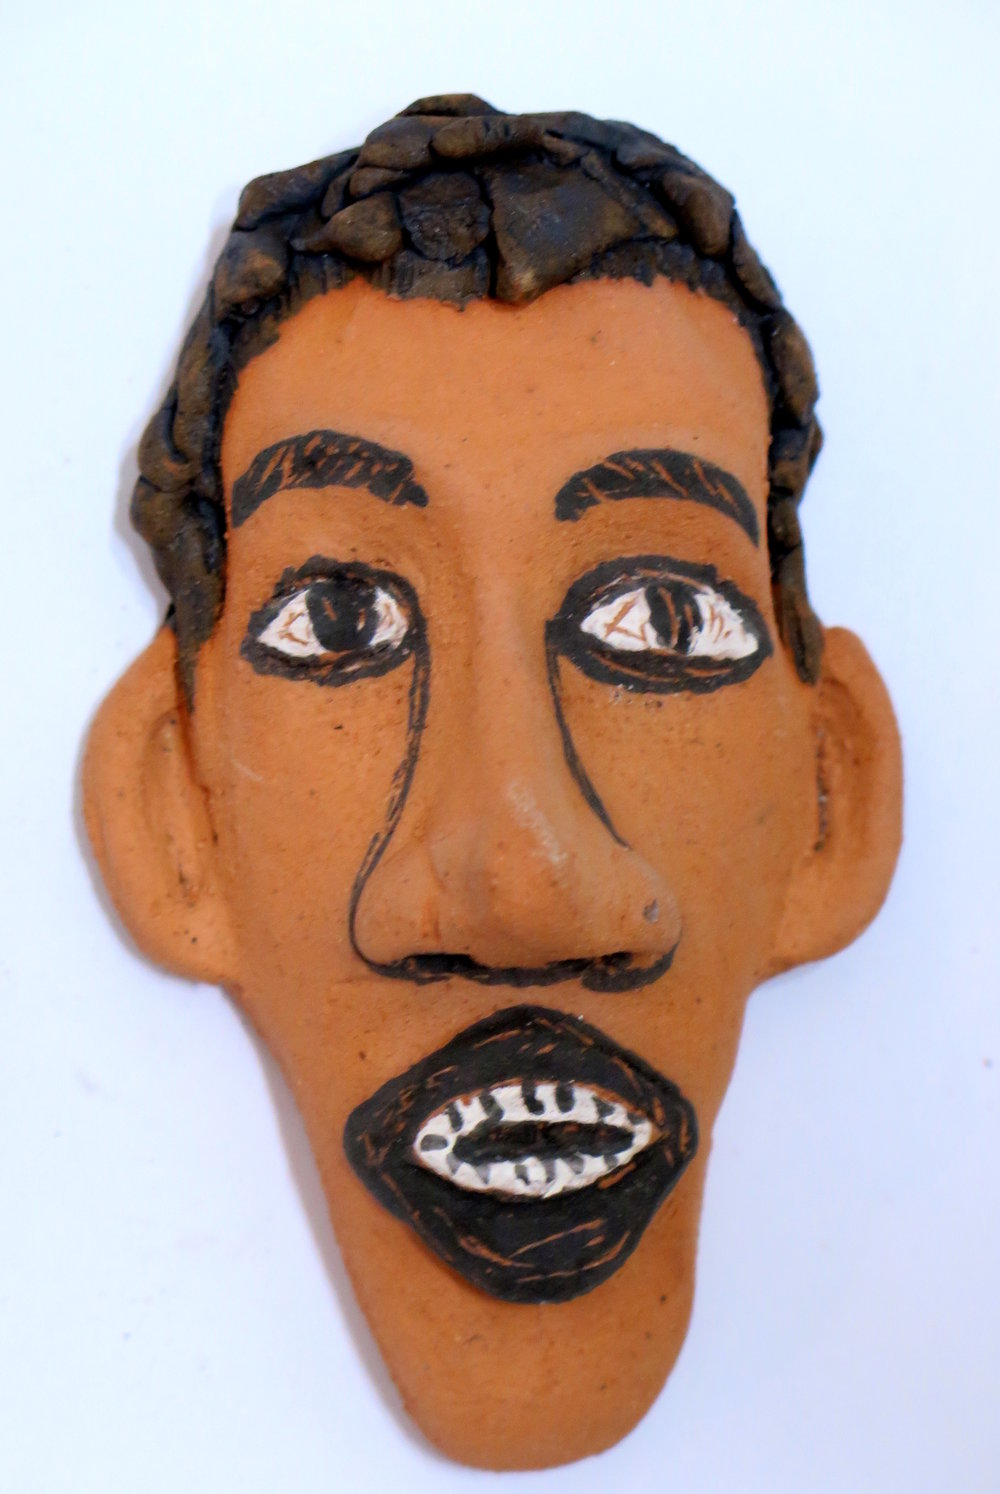 Artist: Siyanda Jacobs